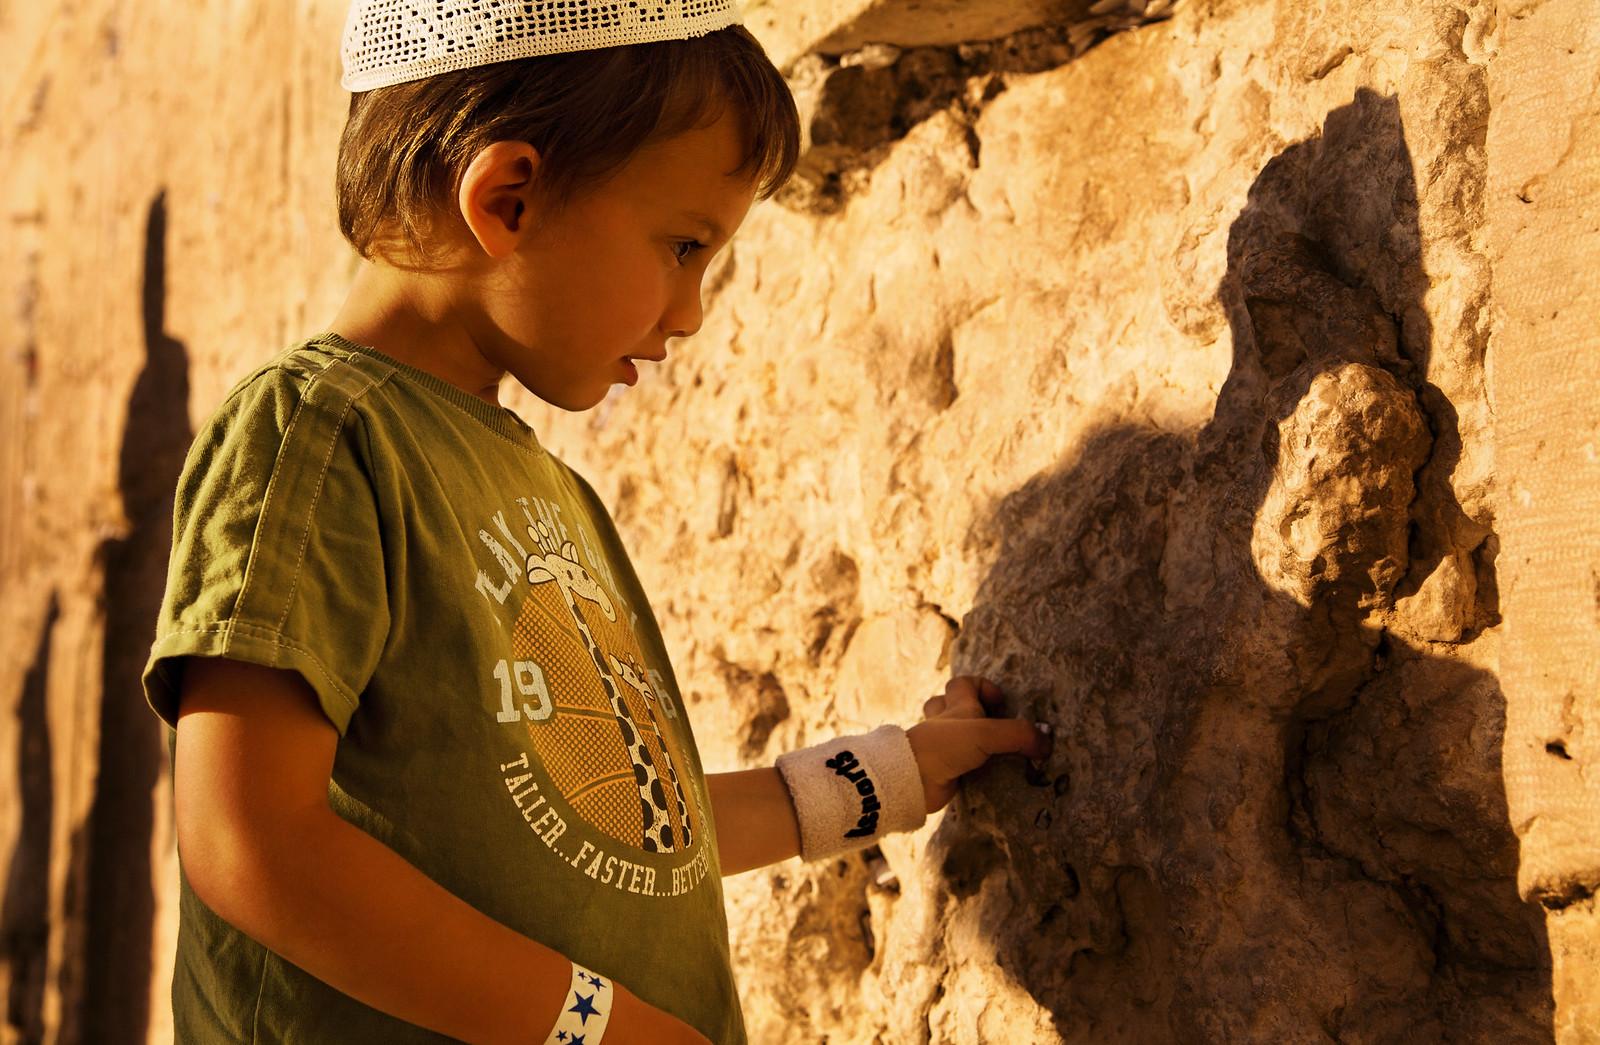 Jerusalem_Western Wall_1_Noam Chen_IMOT